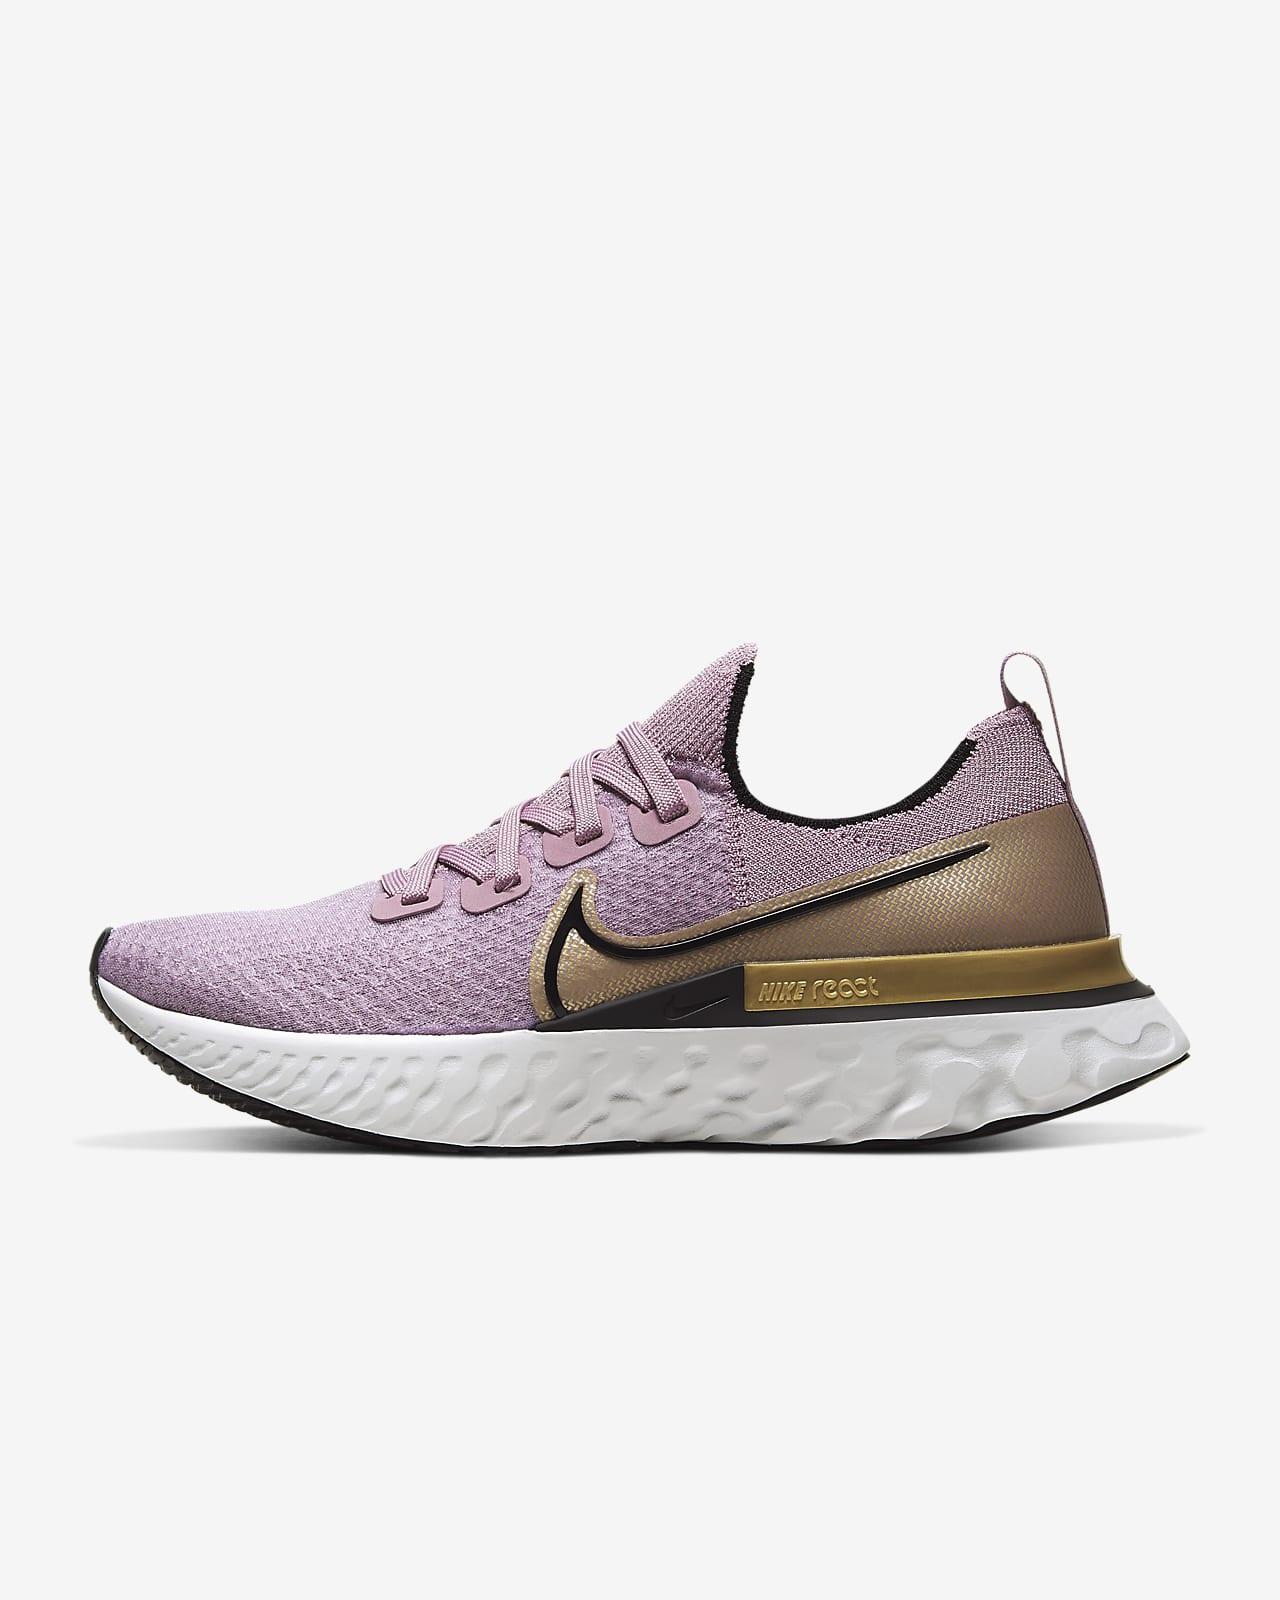 Intervenir agudo laberinto  Nike React Infinity Run Flyknit Women's Running Shoe. Nike.com